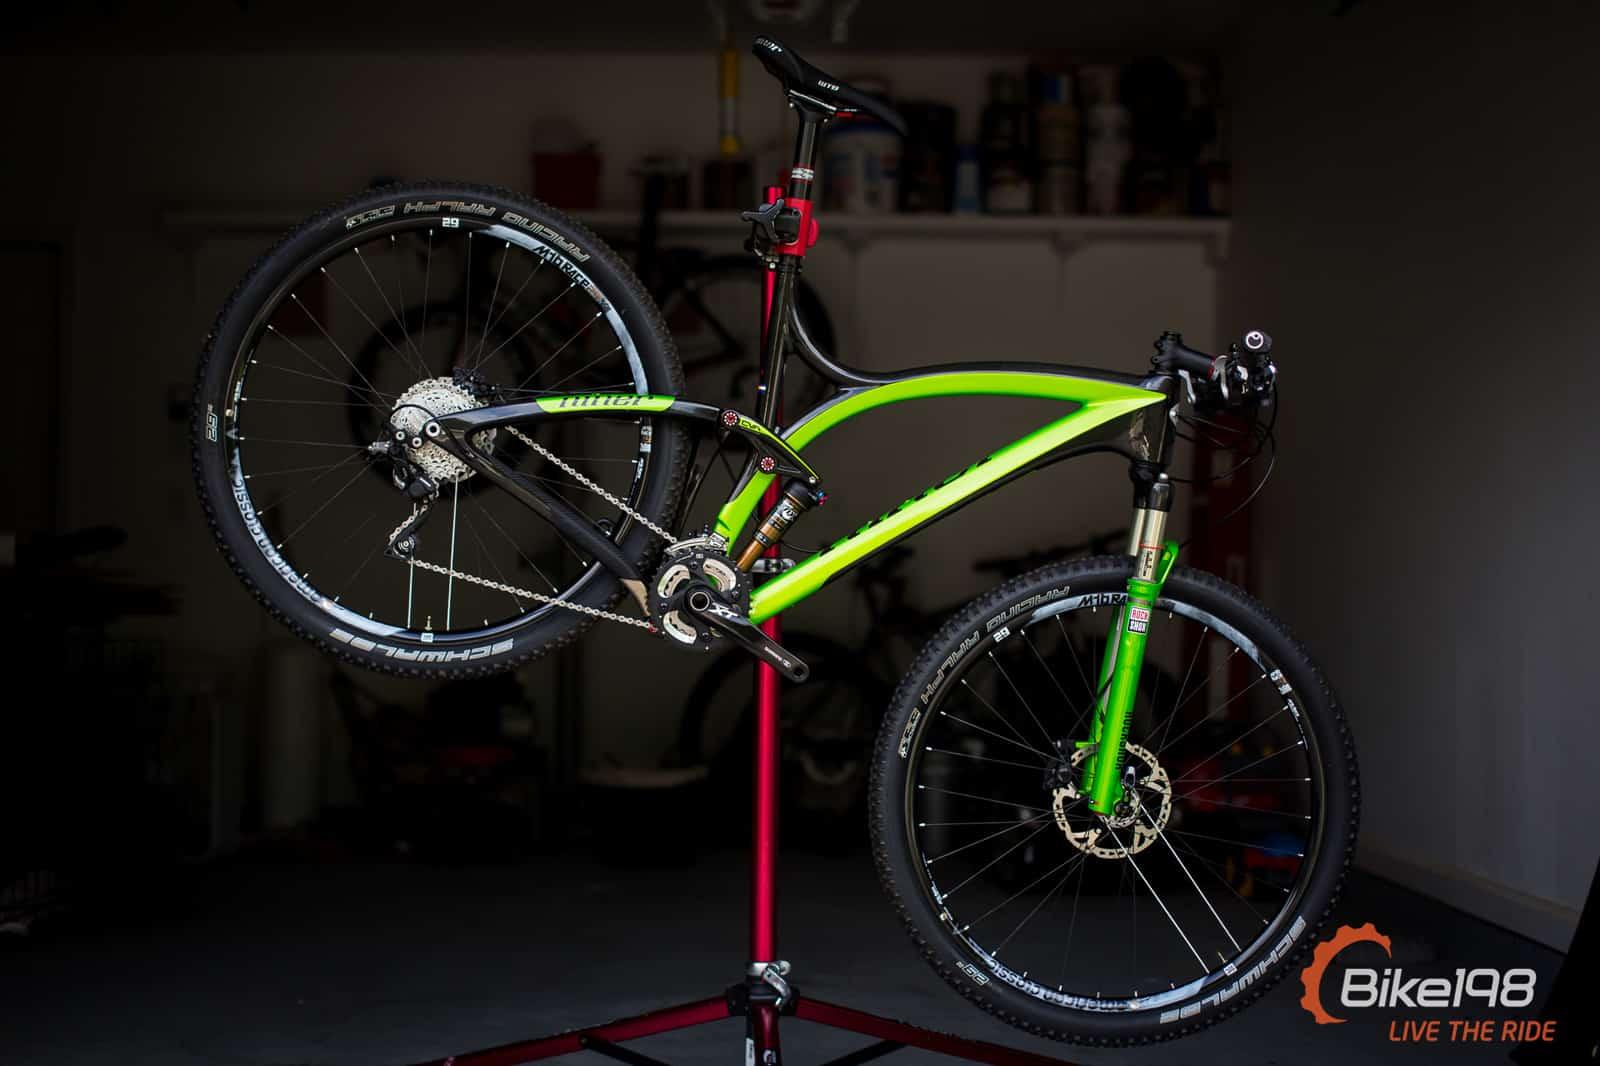 First Look Niner Jet 9 Rdo In Niner Green Bike198